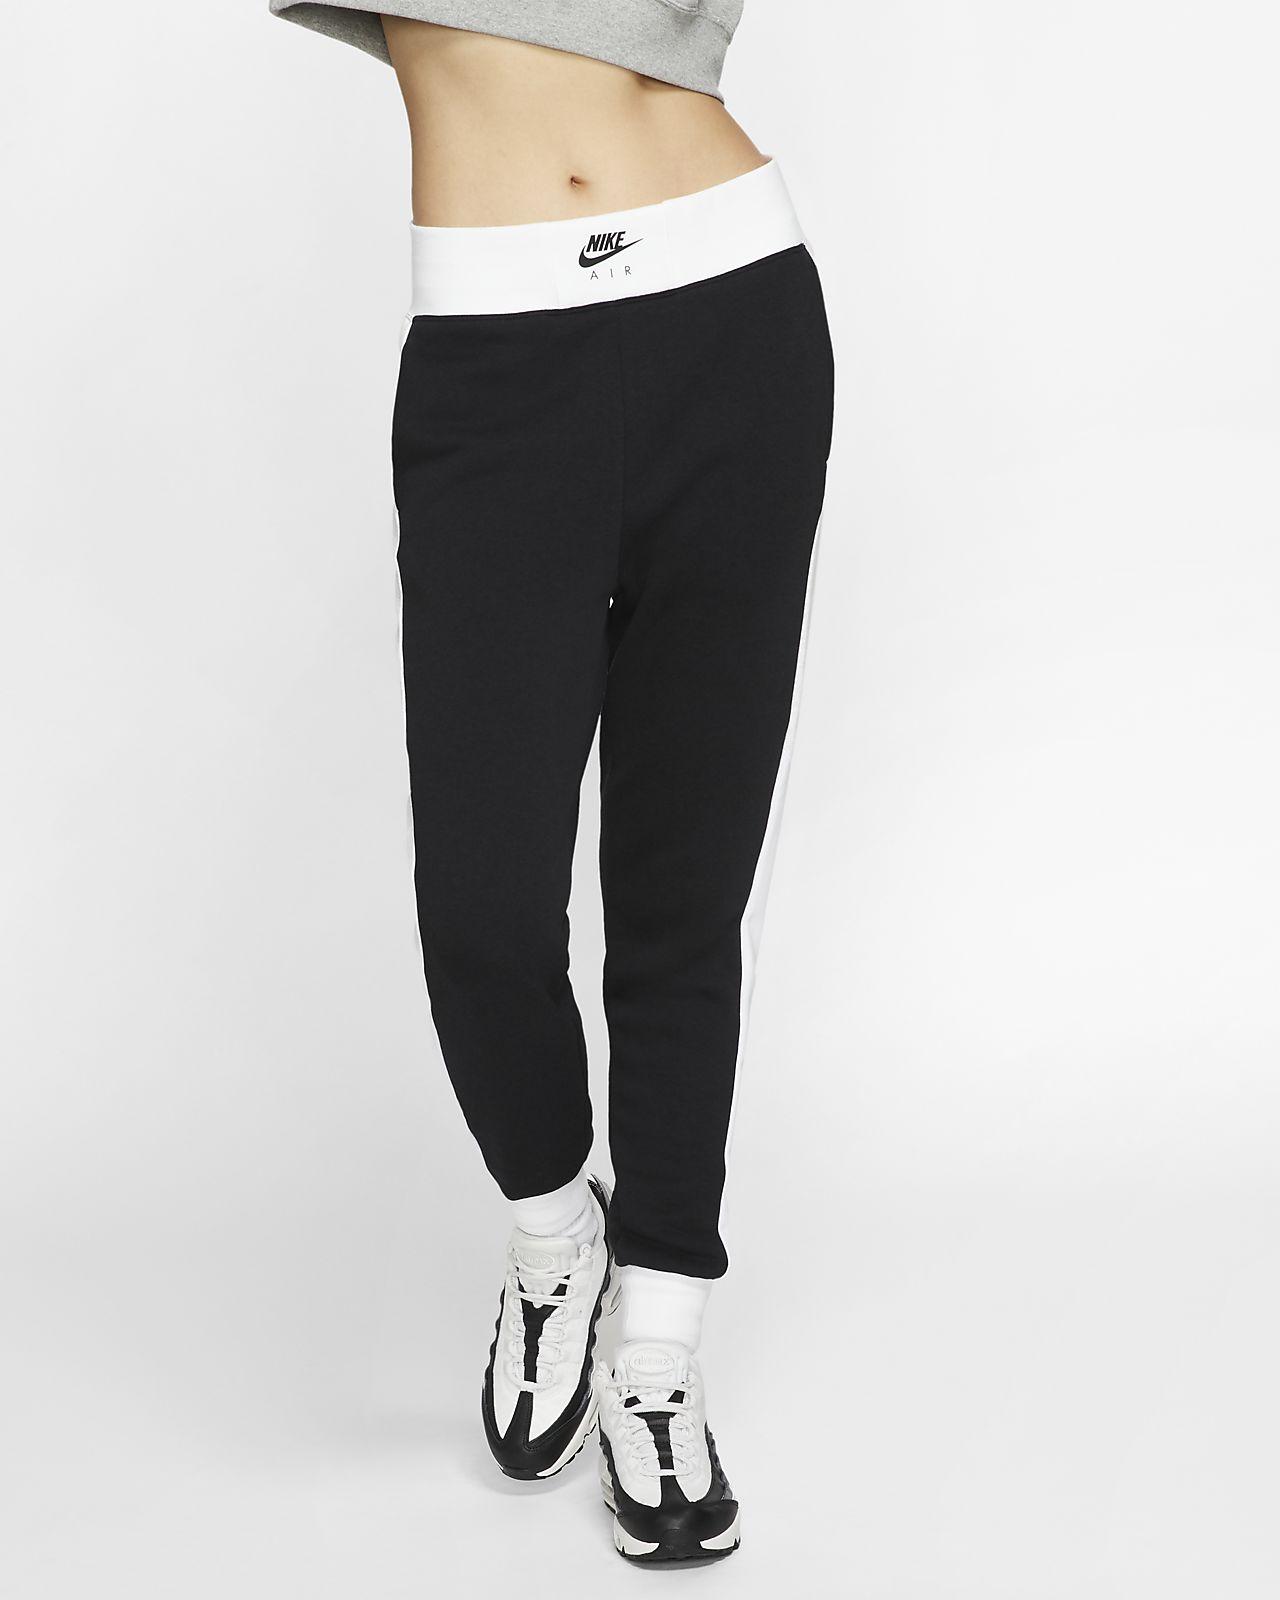 Nike Air női nadrág